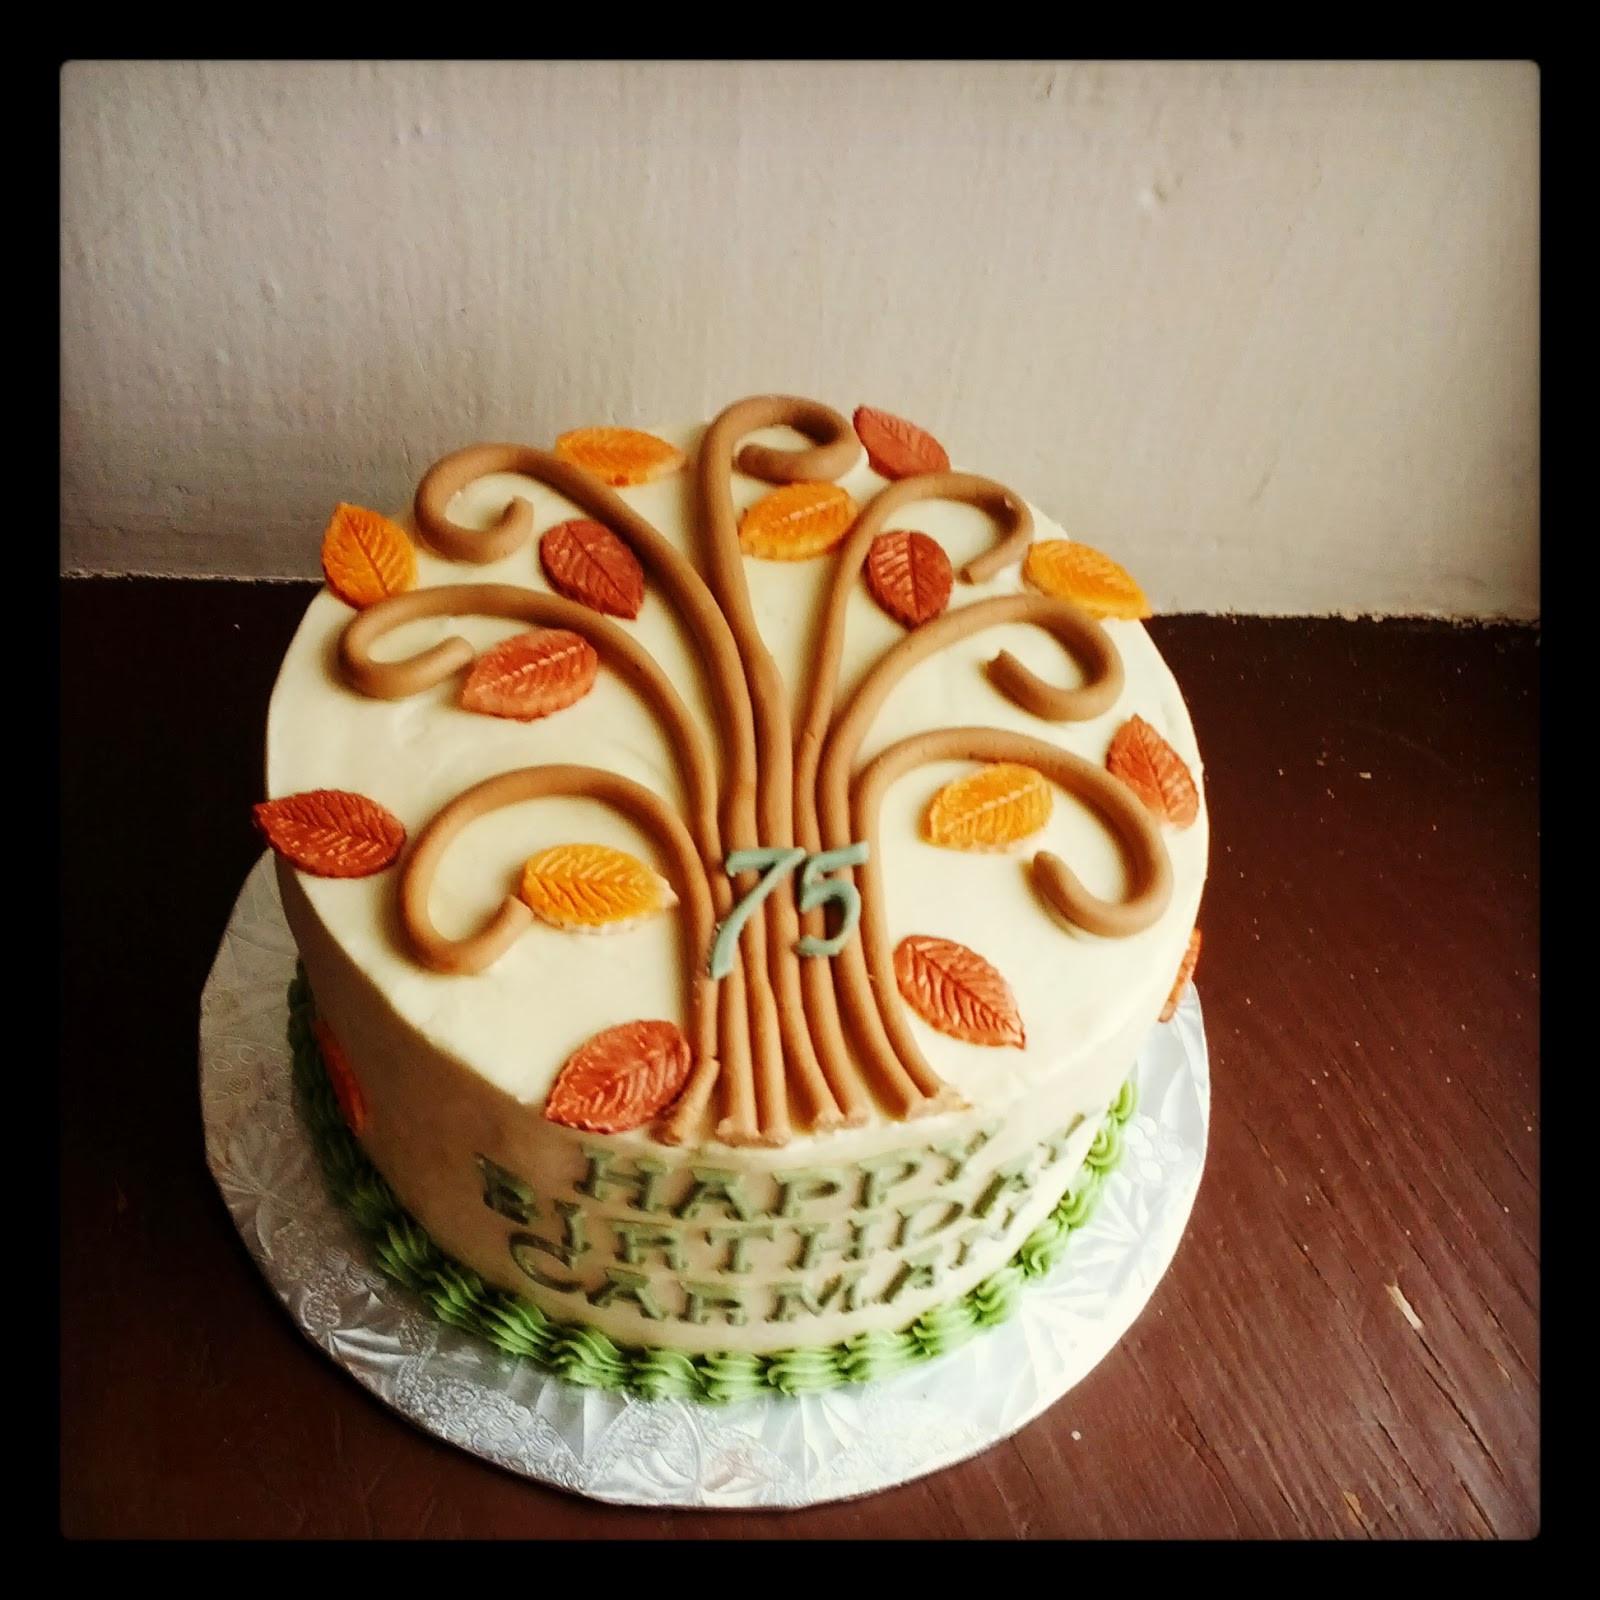 Fall Birthday Cake  Second Generation Cake Design Fall Themed Birthday Cake